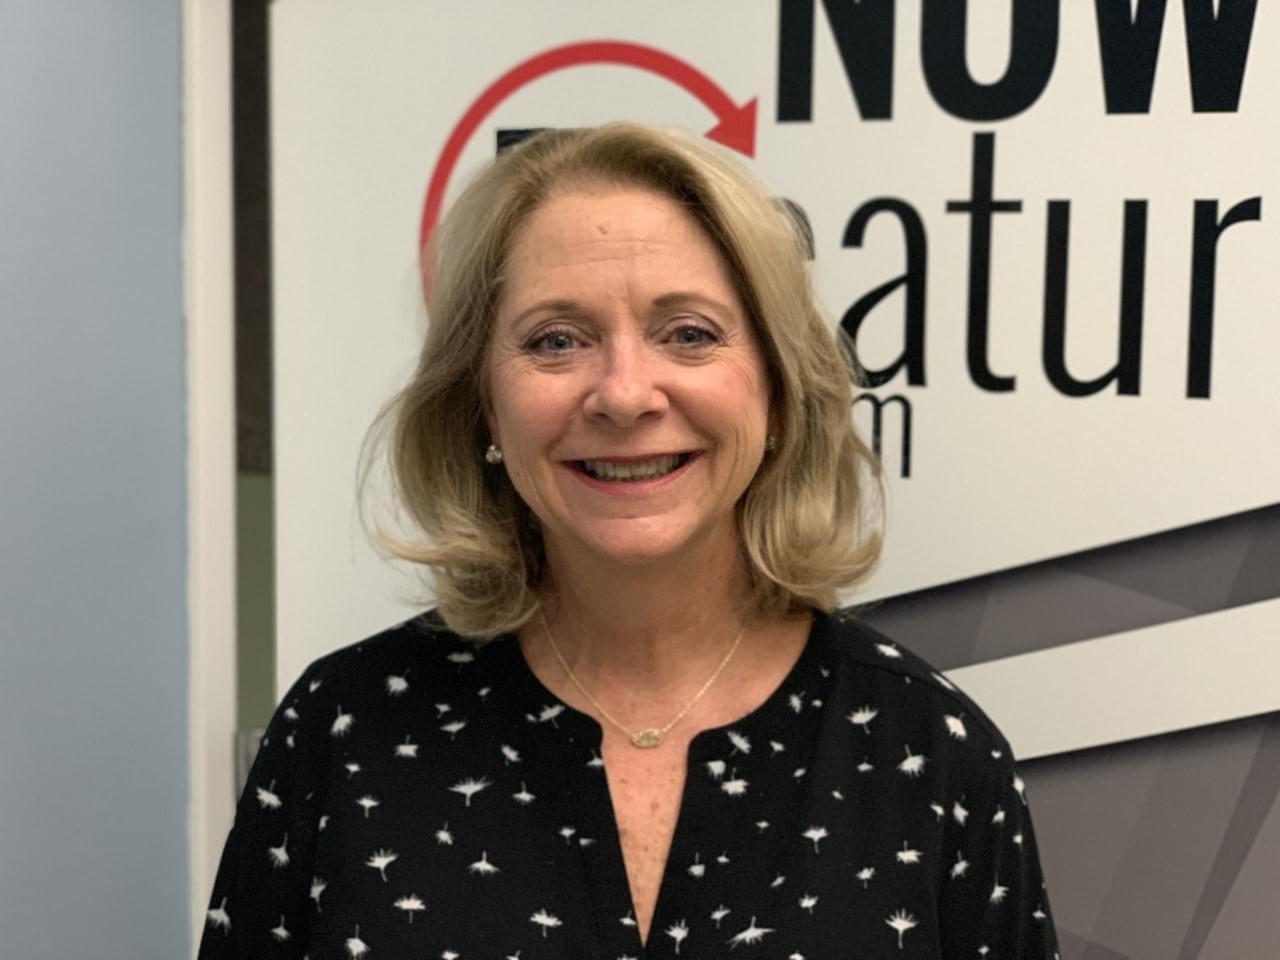 LISTEN: City of Decatur Update with Mayor Julie Moore Wolfe